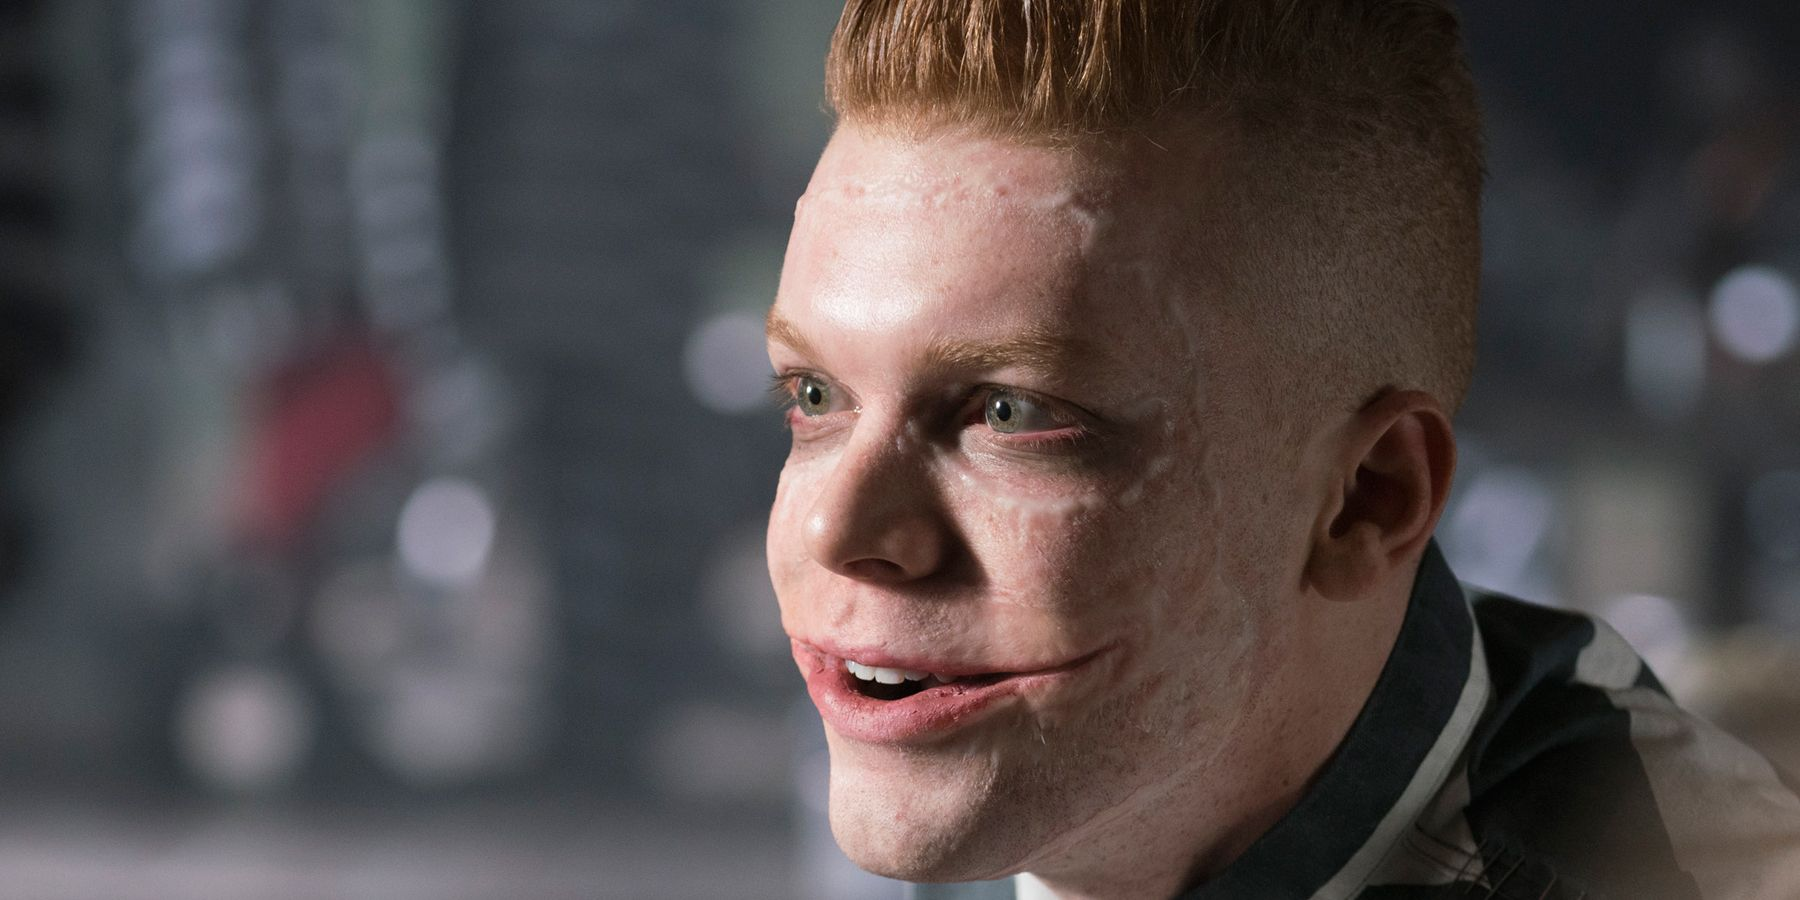 Jerome Gotham